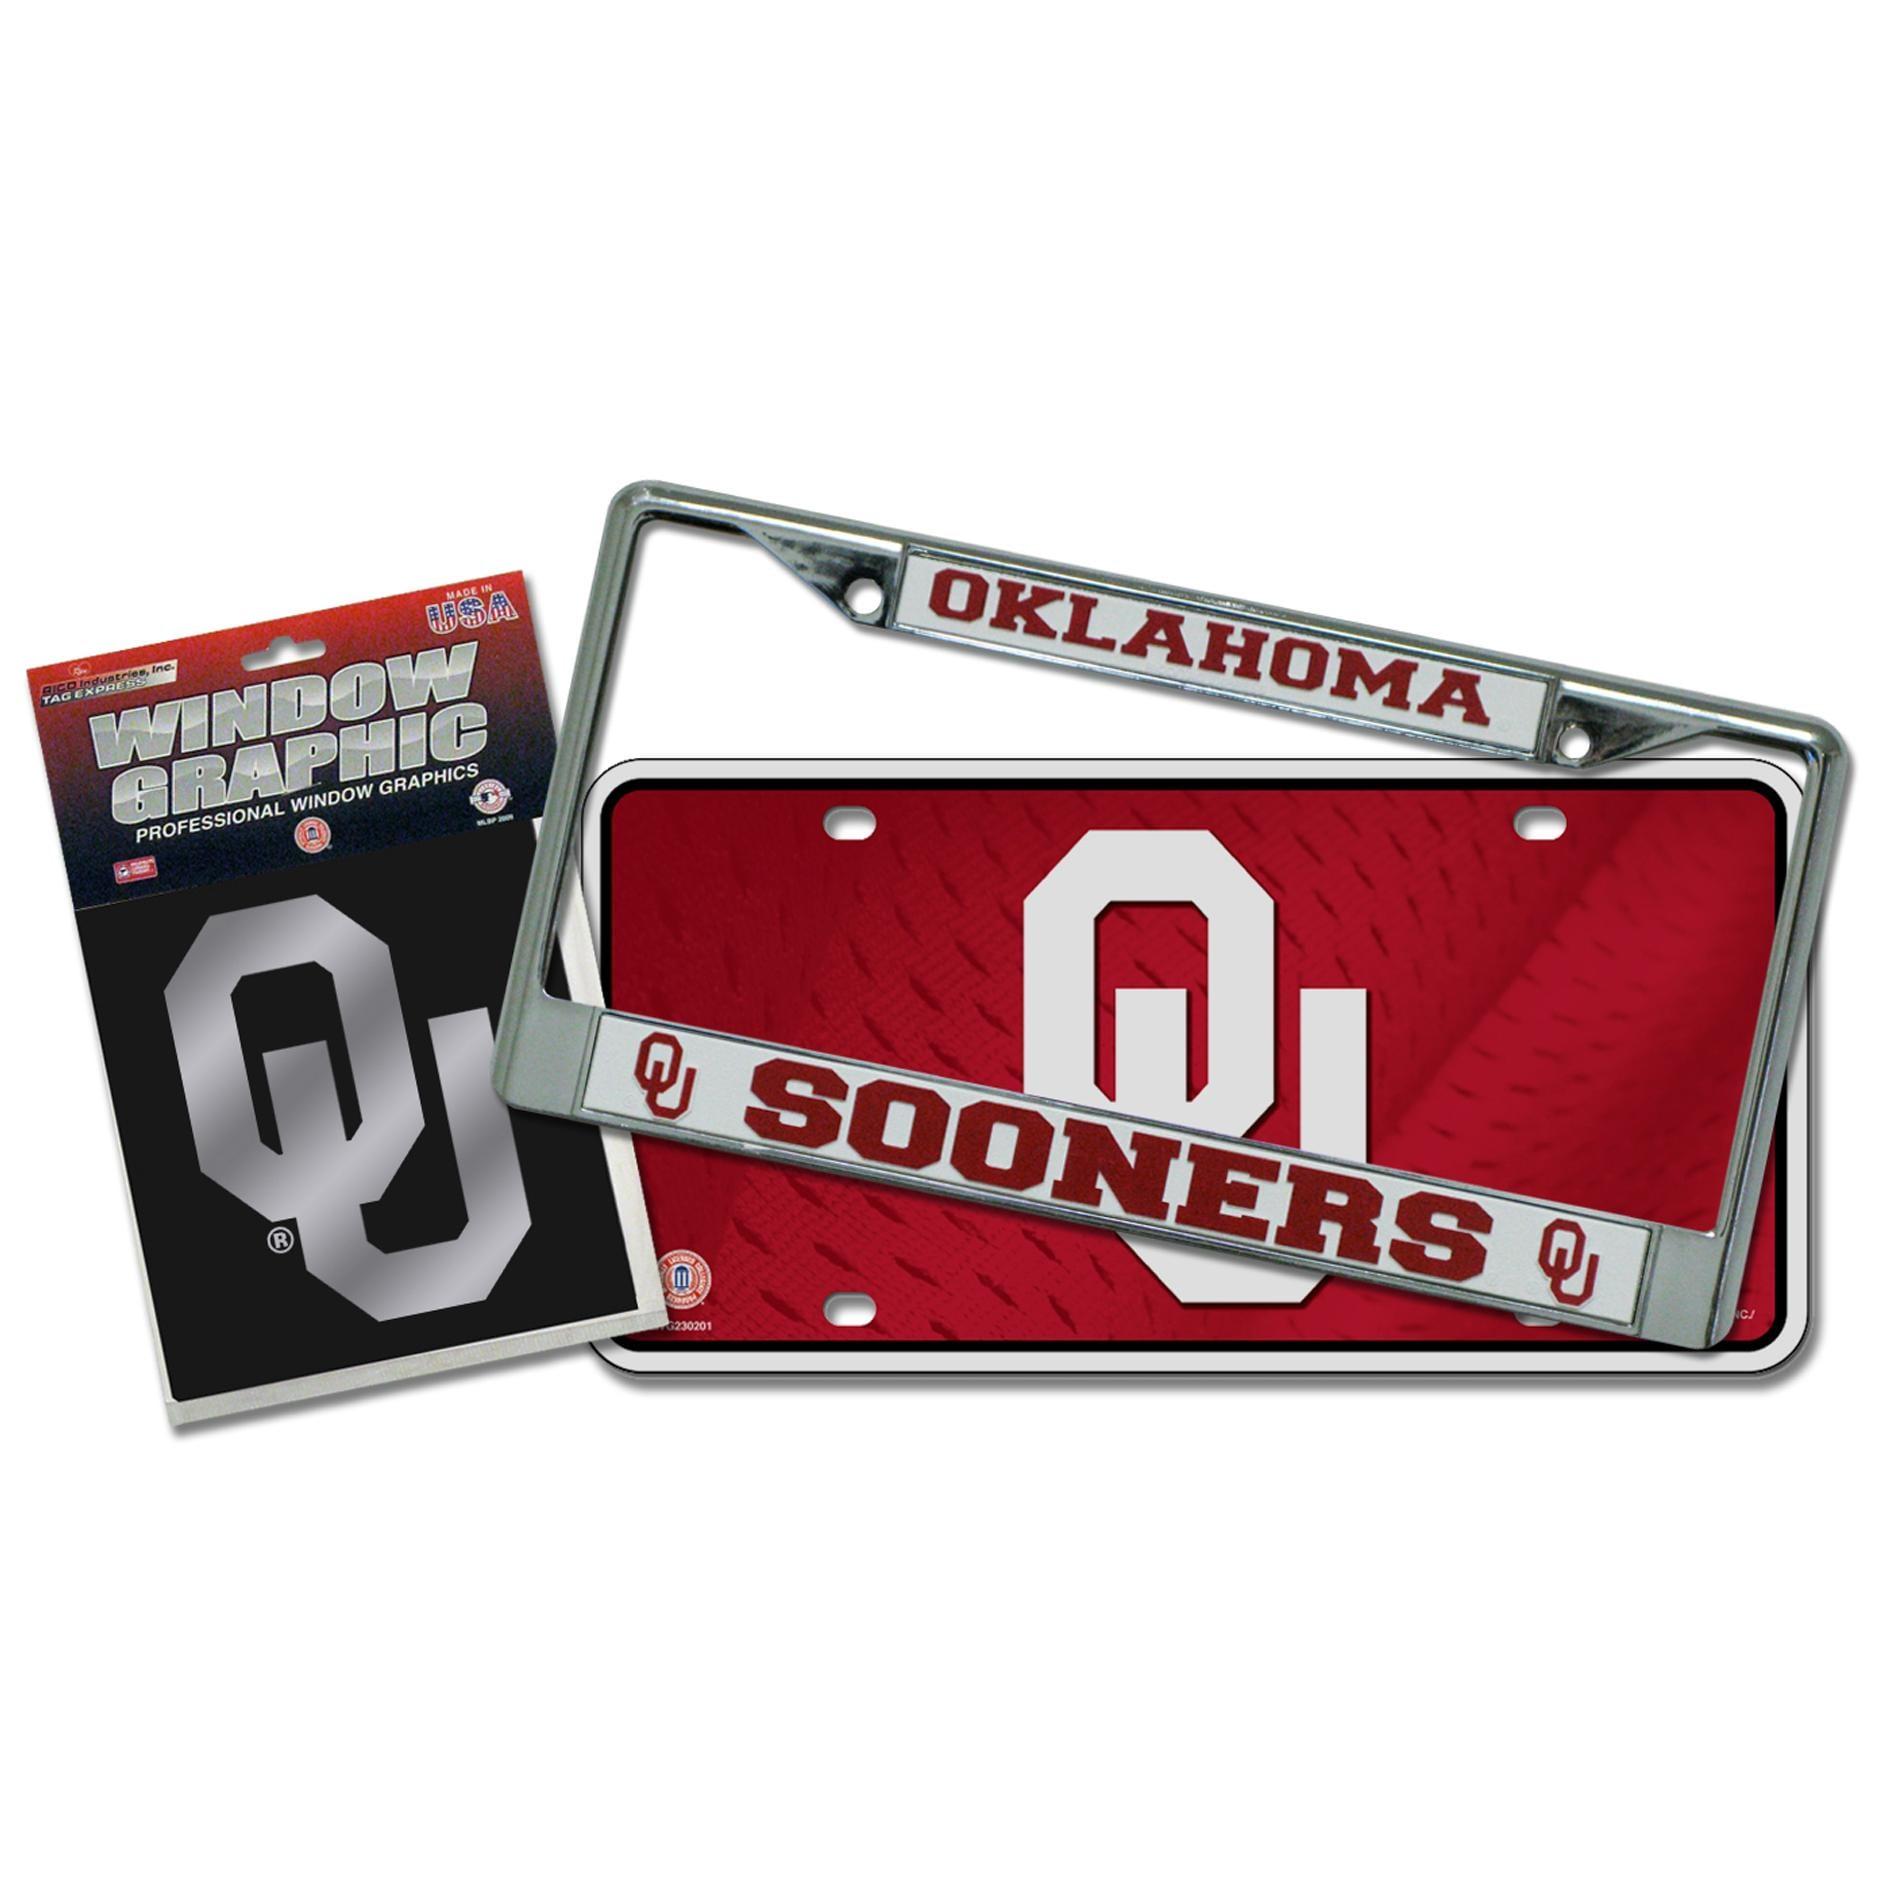 Oklahoma Sooners Automotvie Detail Pack